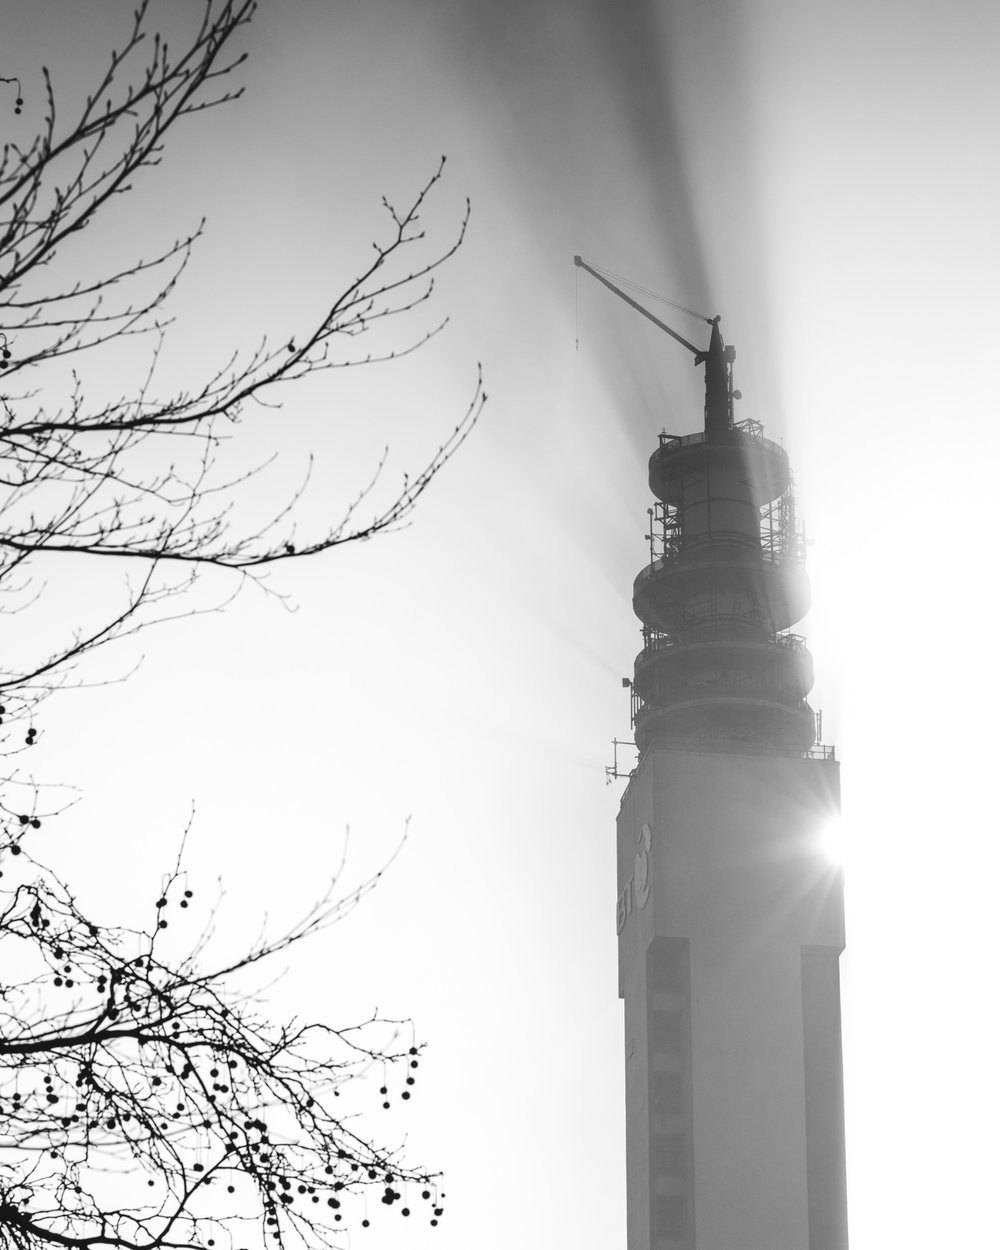 Ross Jukes Photography Birmingham Skyline - www.rossjukesphoto.co.uk